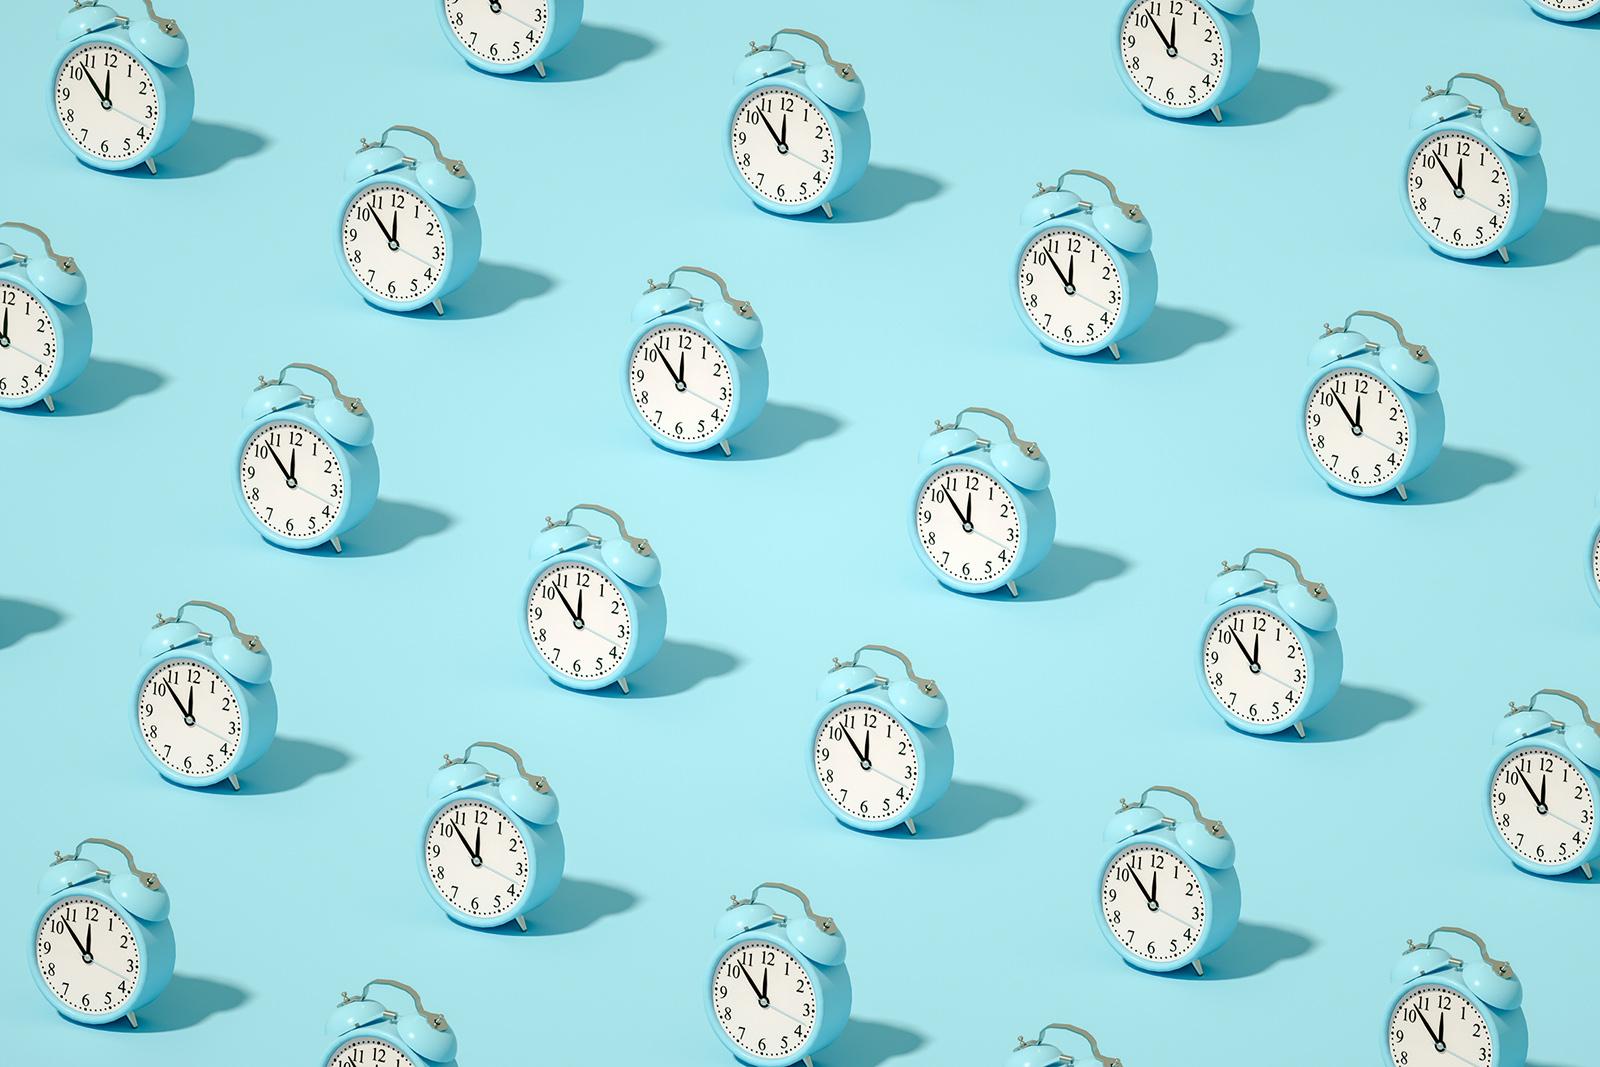 alarm clocks on blue - better sleep schedule